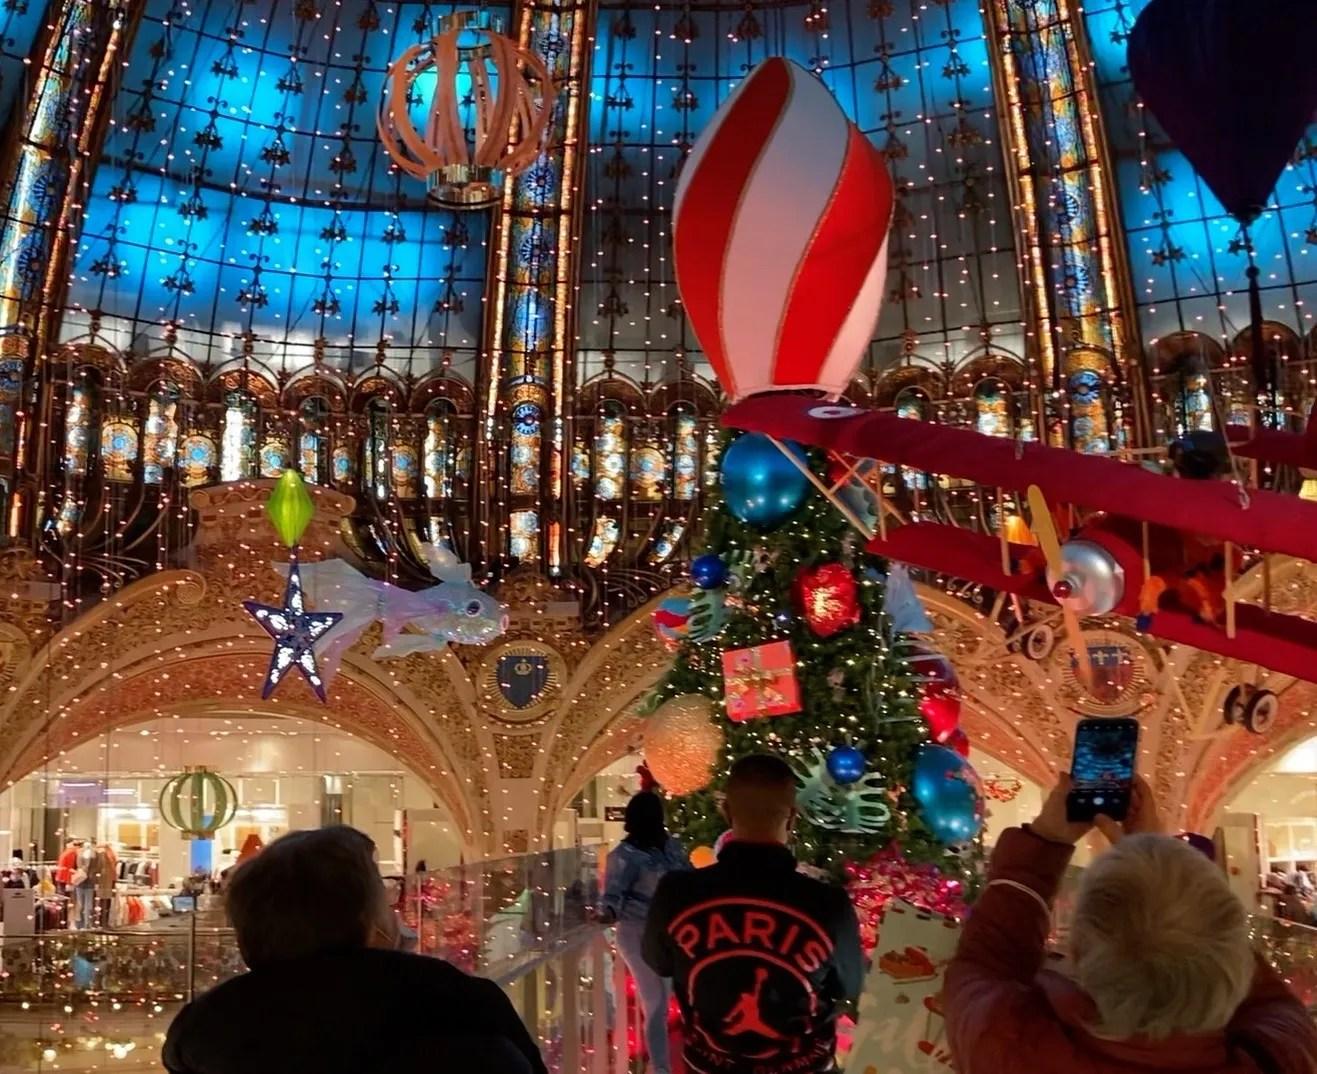 Noël Voyage in Paris